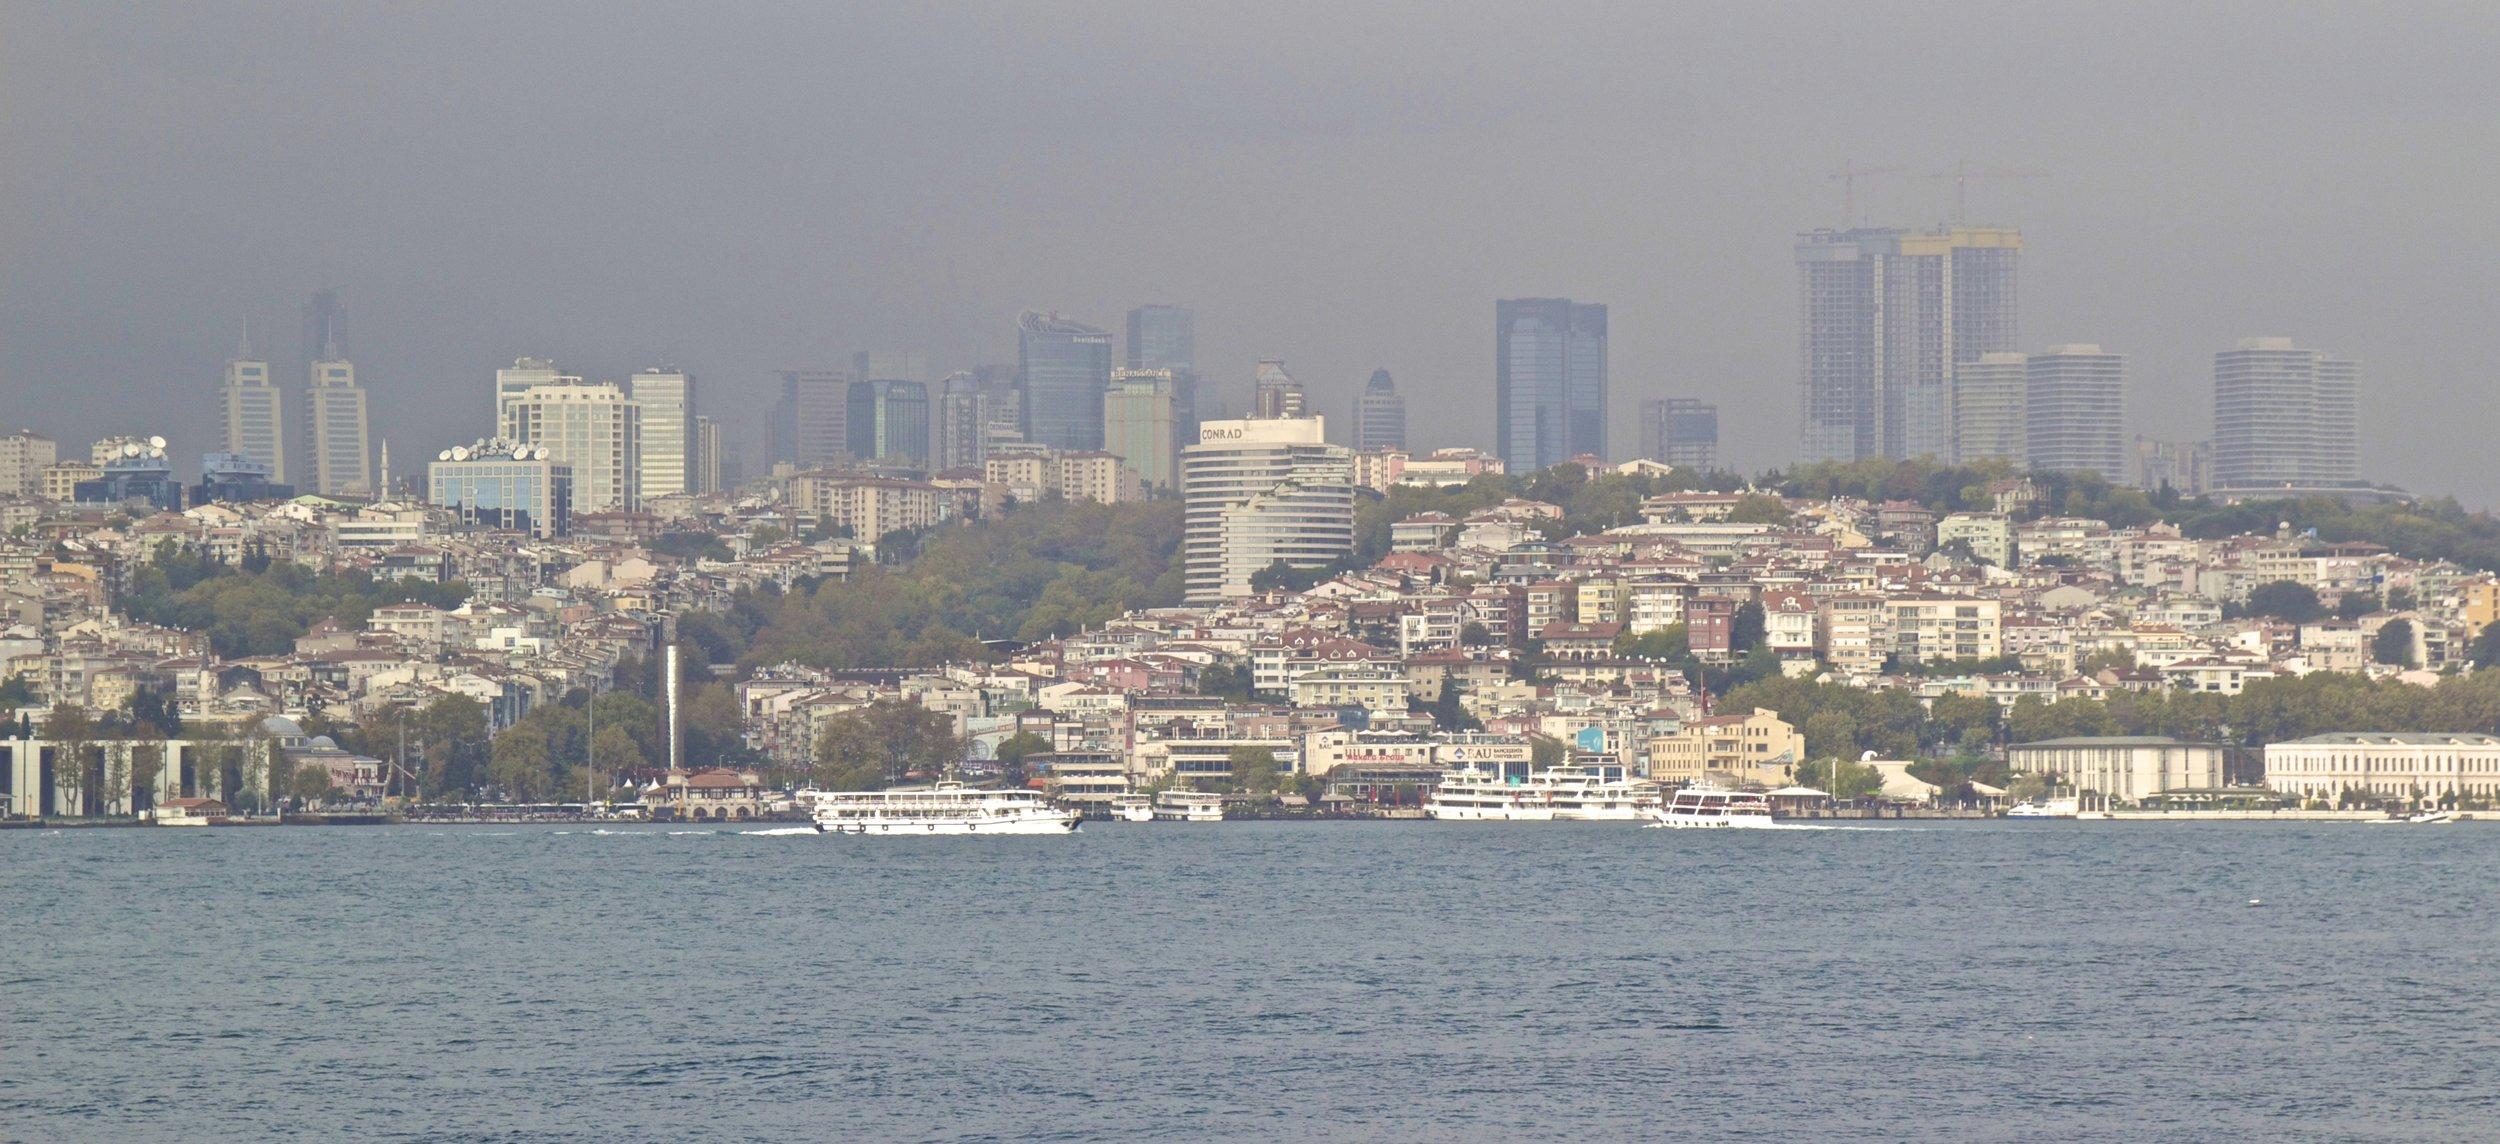 bosphorus istanbul turkey 6.jpg